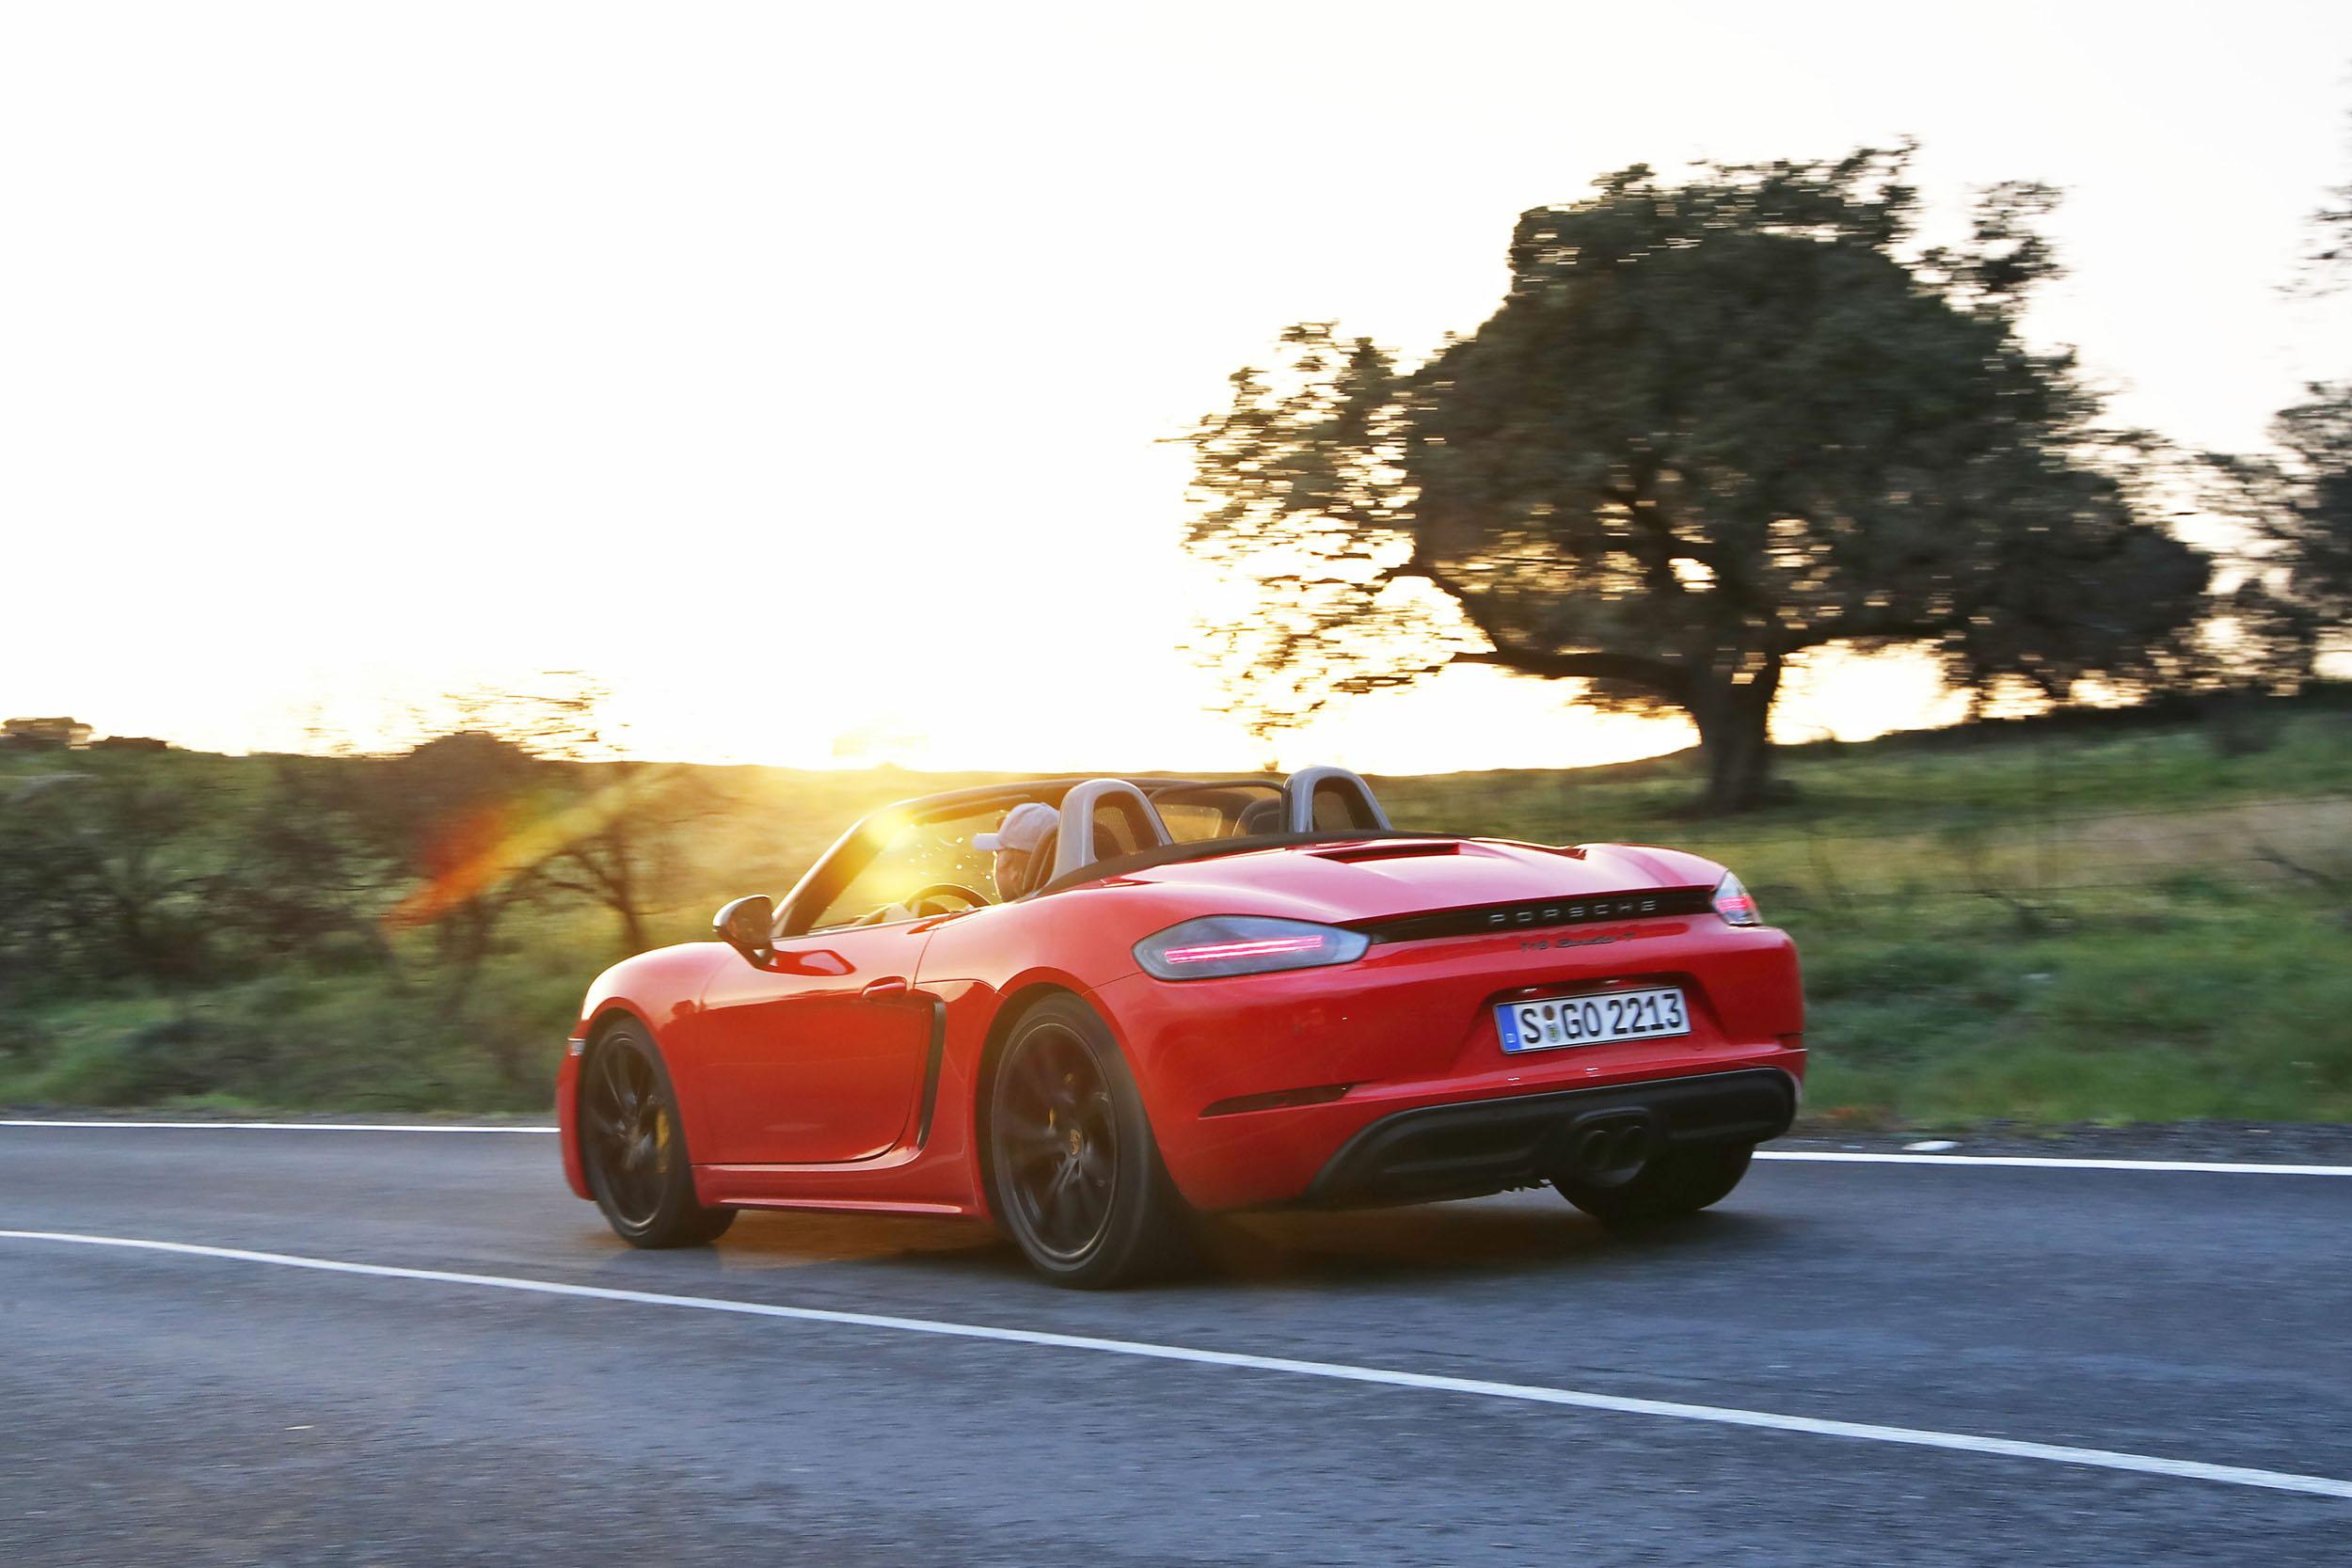 The 2020 Porsche 718 Boxster T [2]